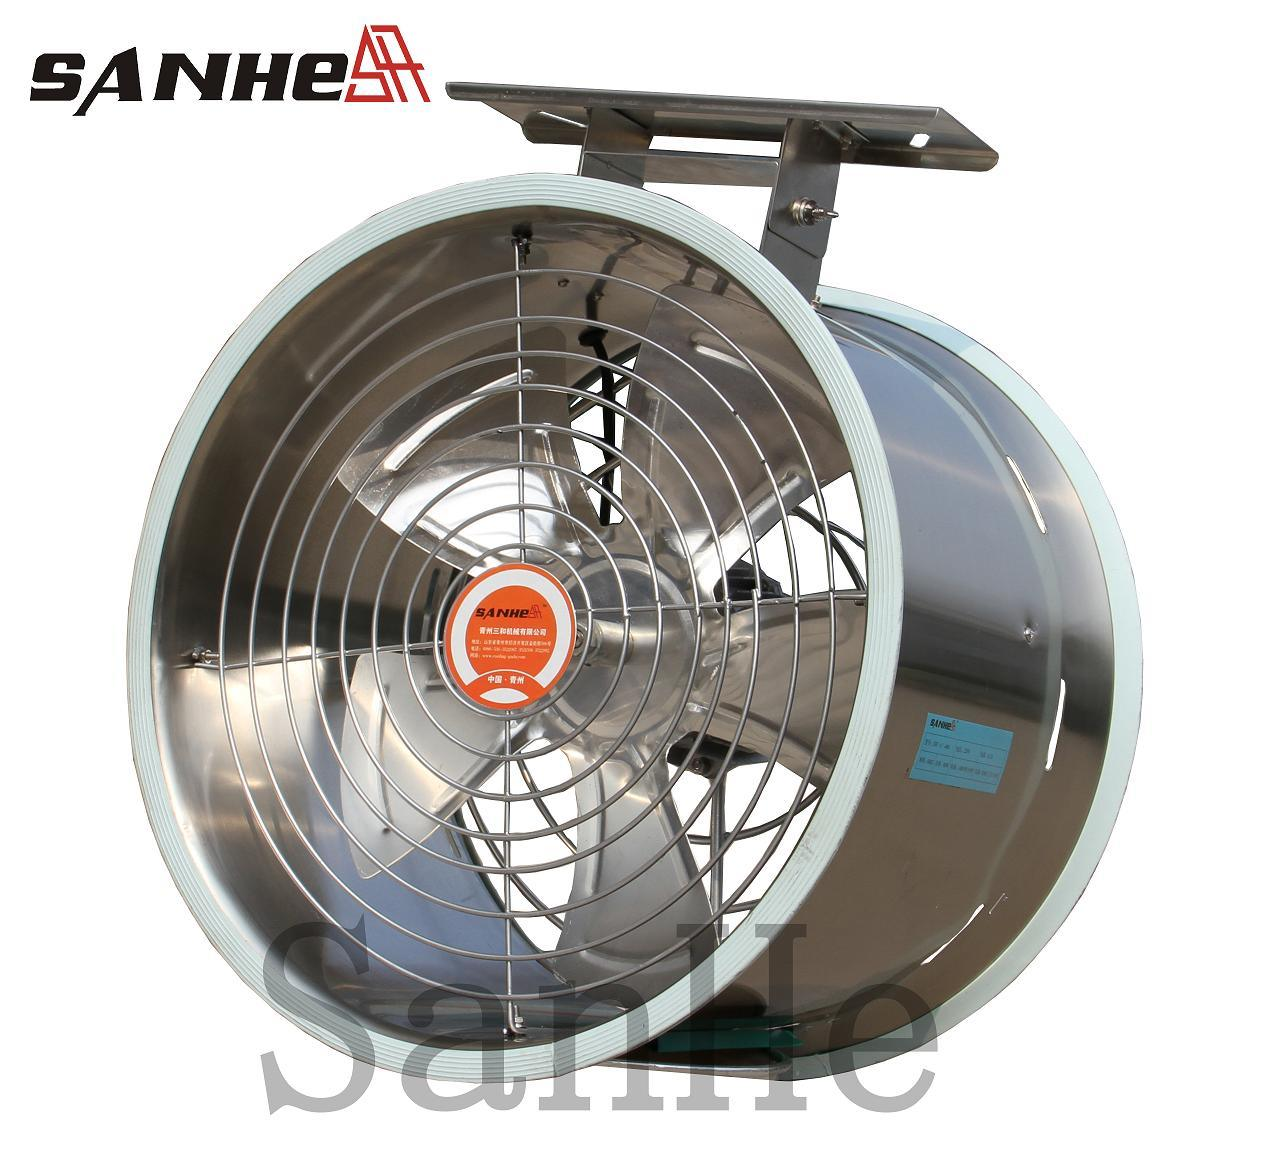 Greenhouse Air Circulation : Air circulation fan pour greenhouse avec du ce